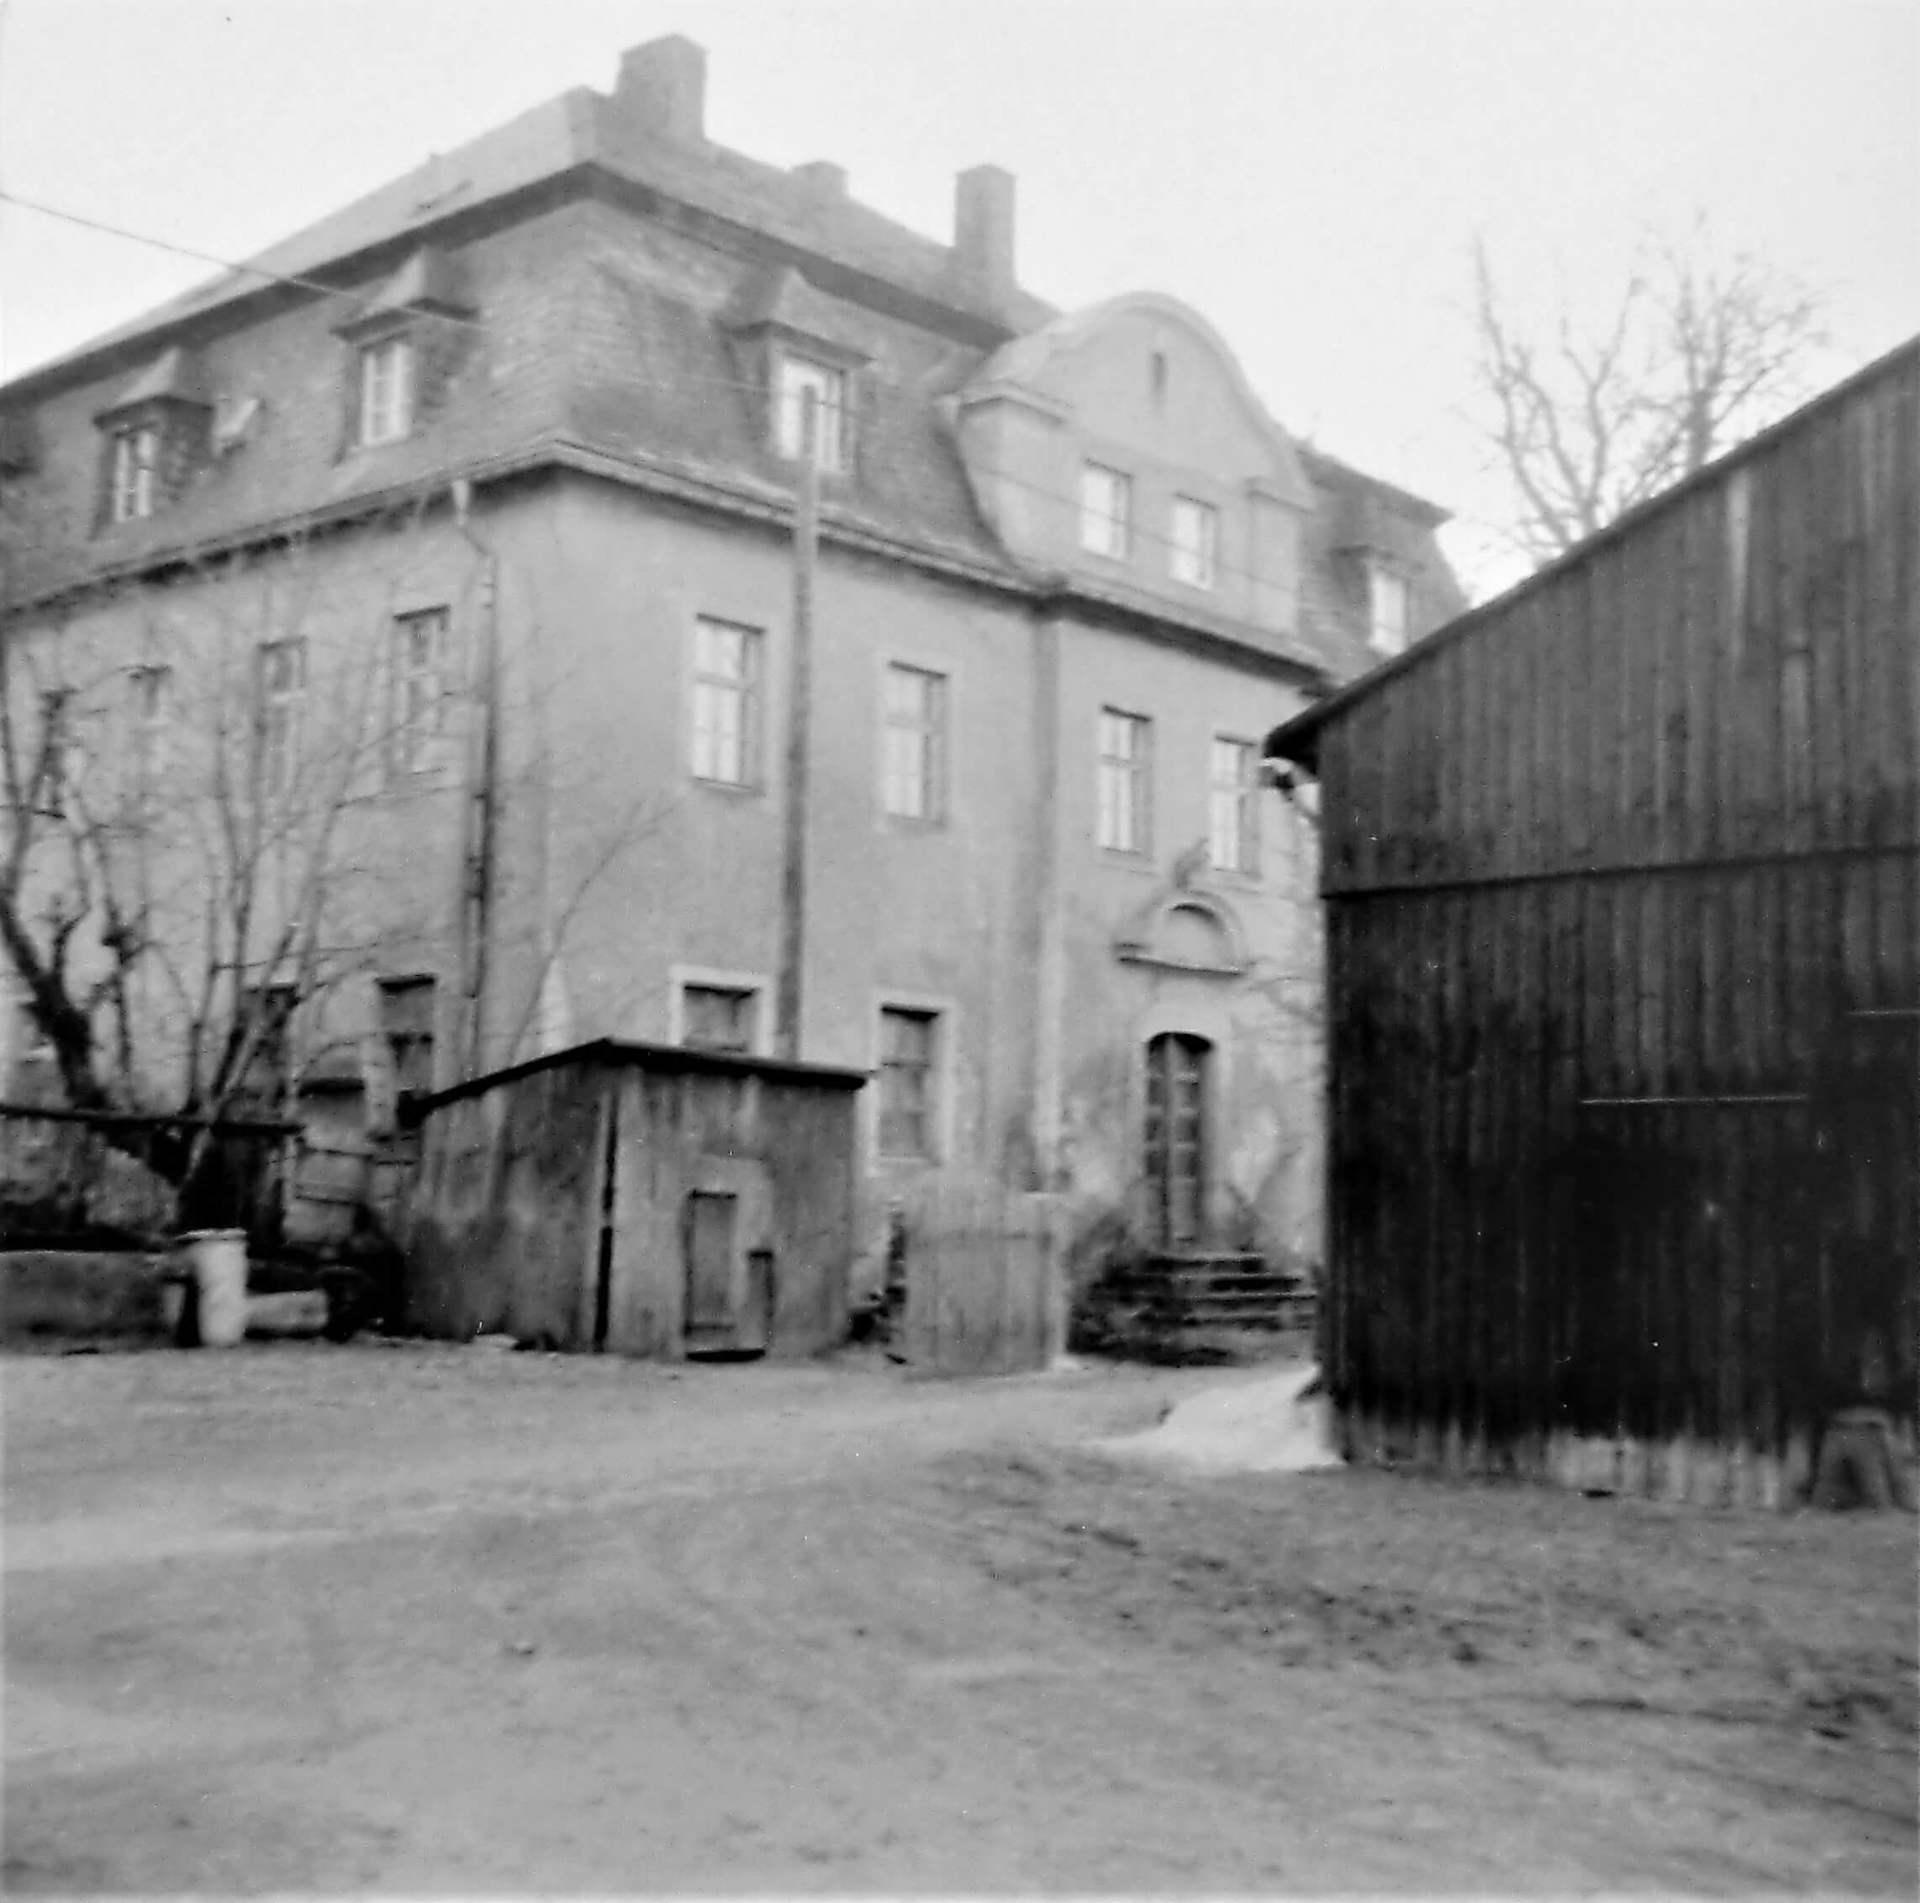 Rittergut Adlershof zu Oberlauterbach - verfallenes Herrenhaus © Fotostudio Pieschel